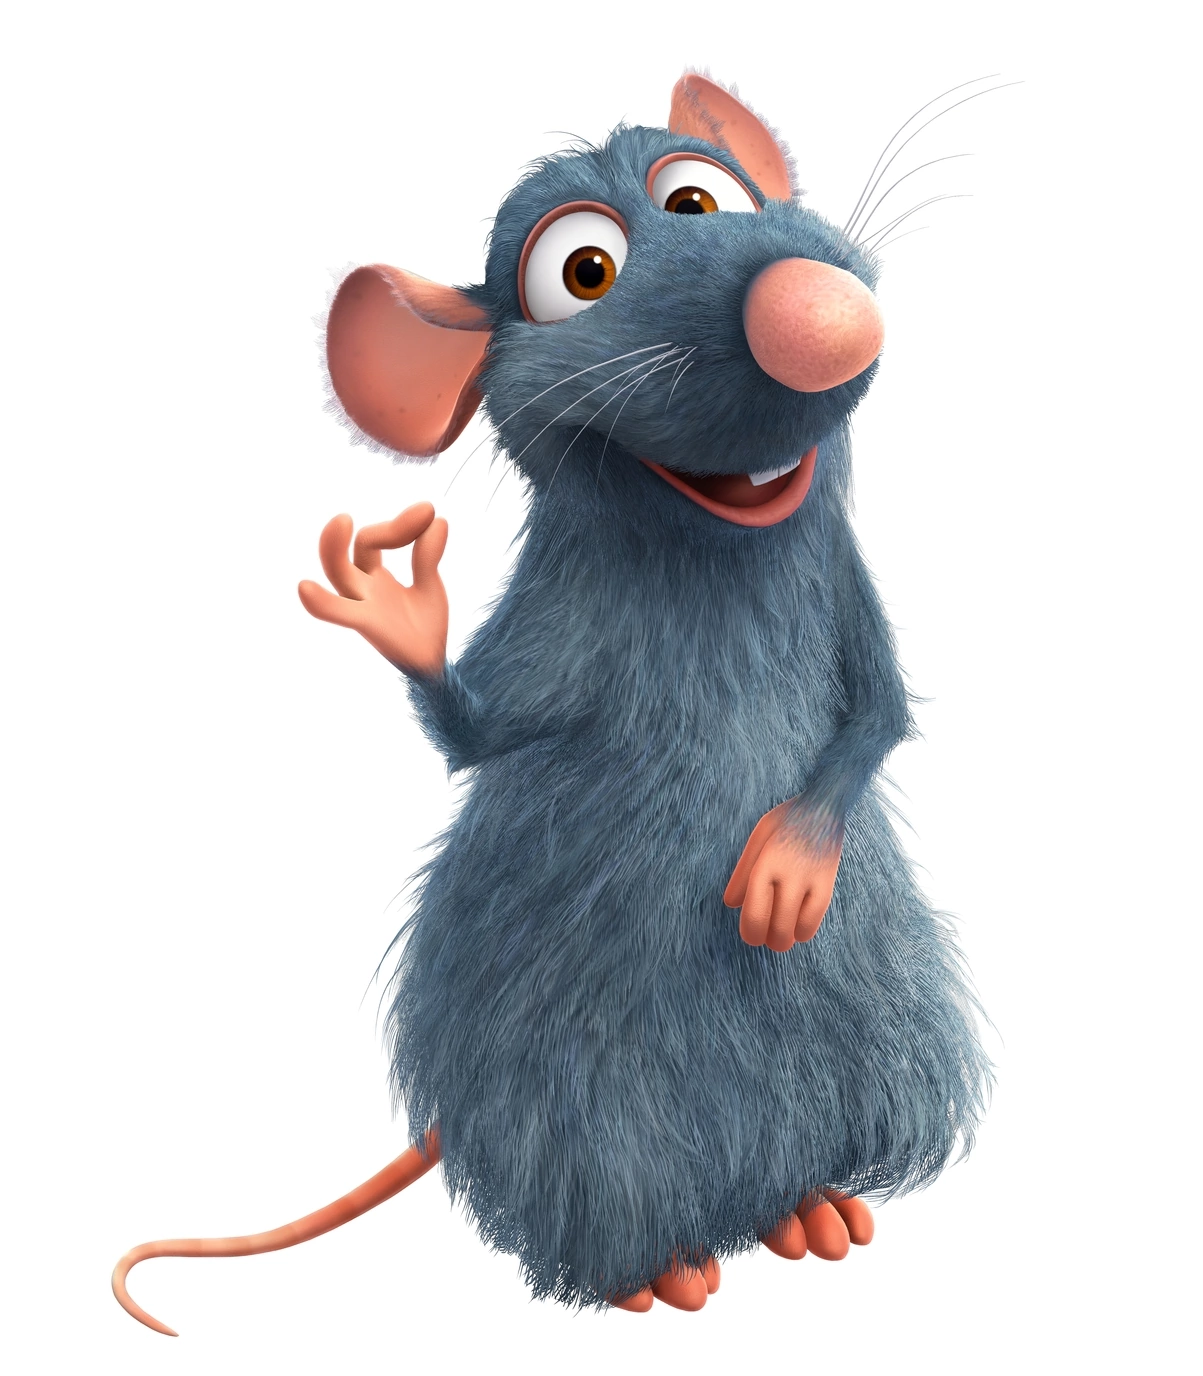 Kingdom Hearts Iii Gallery Disney Wiki Fandom In 2020 Disney Art Of Animation Ratatouille Disney Disney Characters Nemo